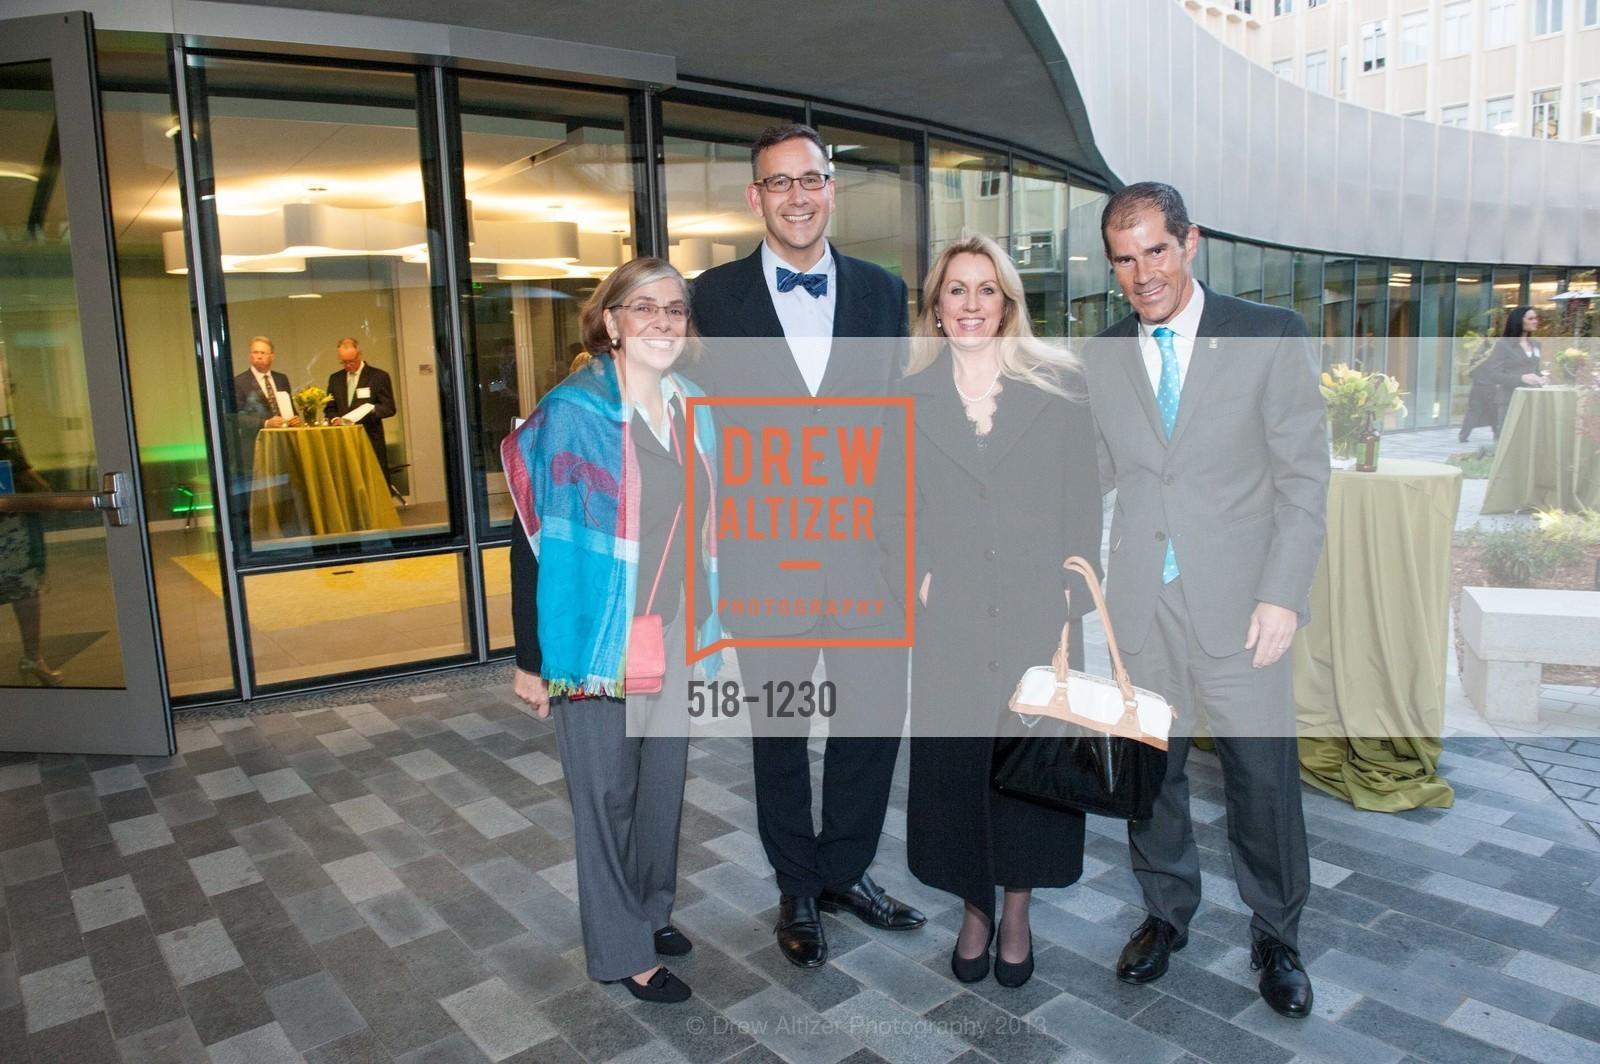 Elizabeth Hill, Peter Novak, Jenny Turbin, Chris Nicholson, Photo #518-1230